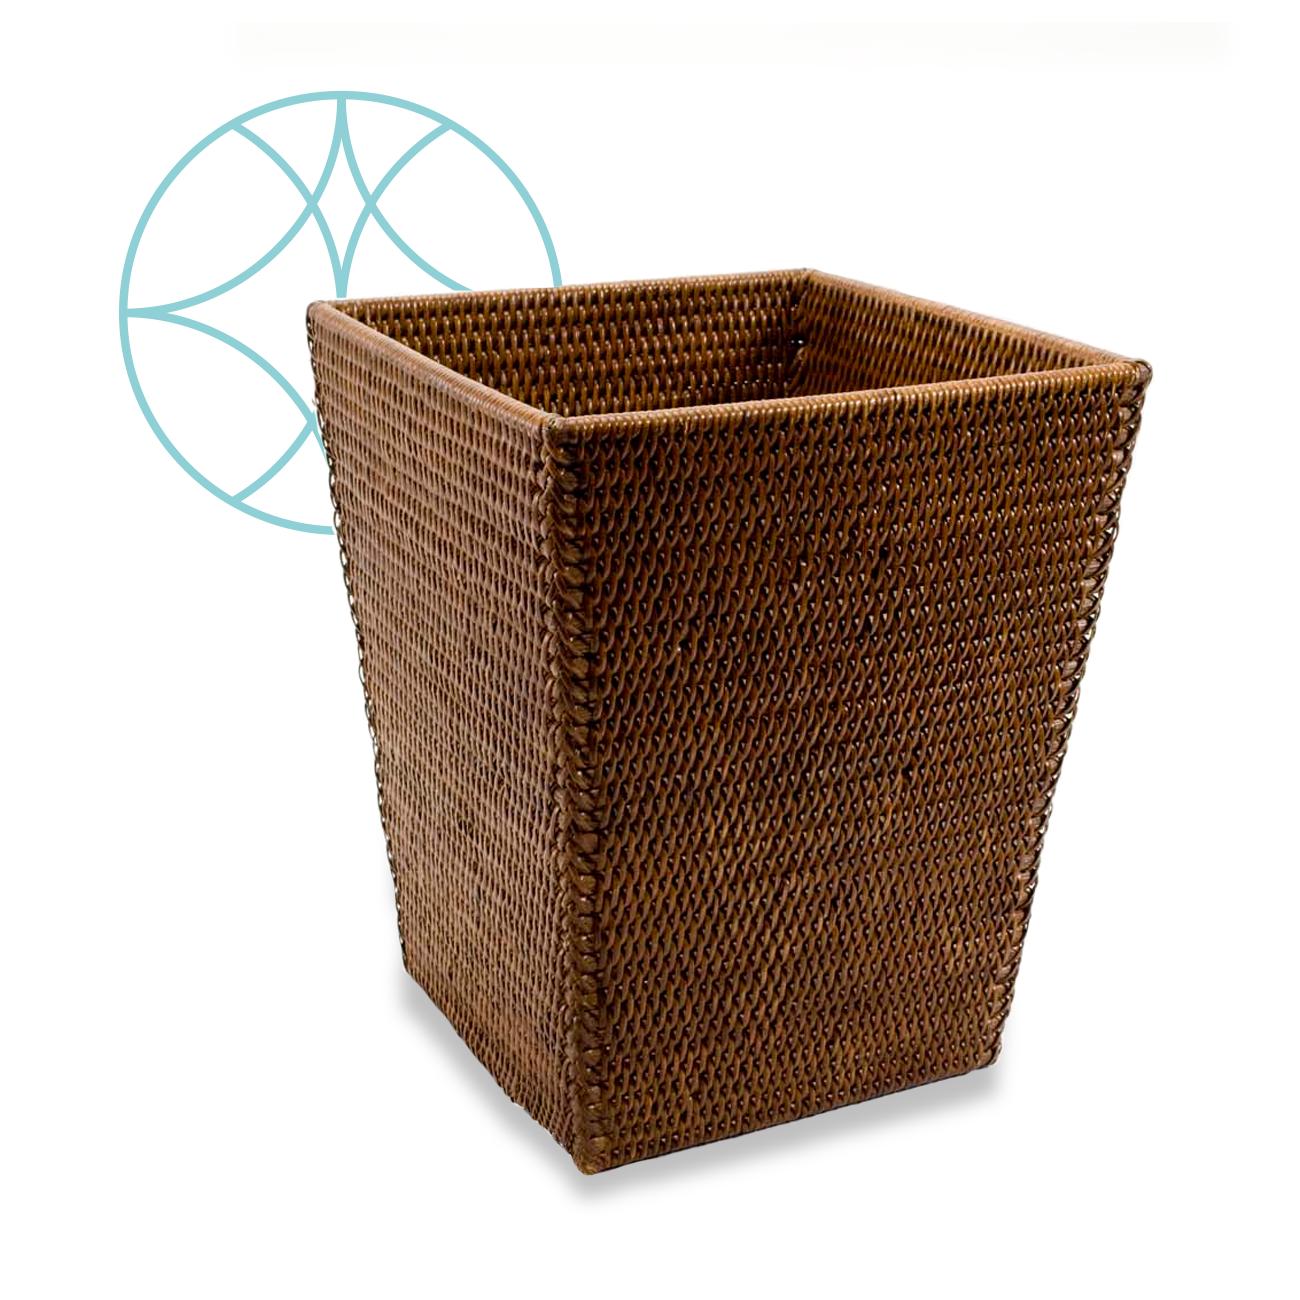 Wastbasket_1.png